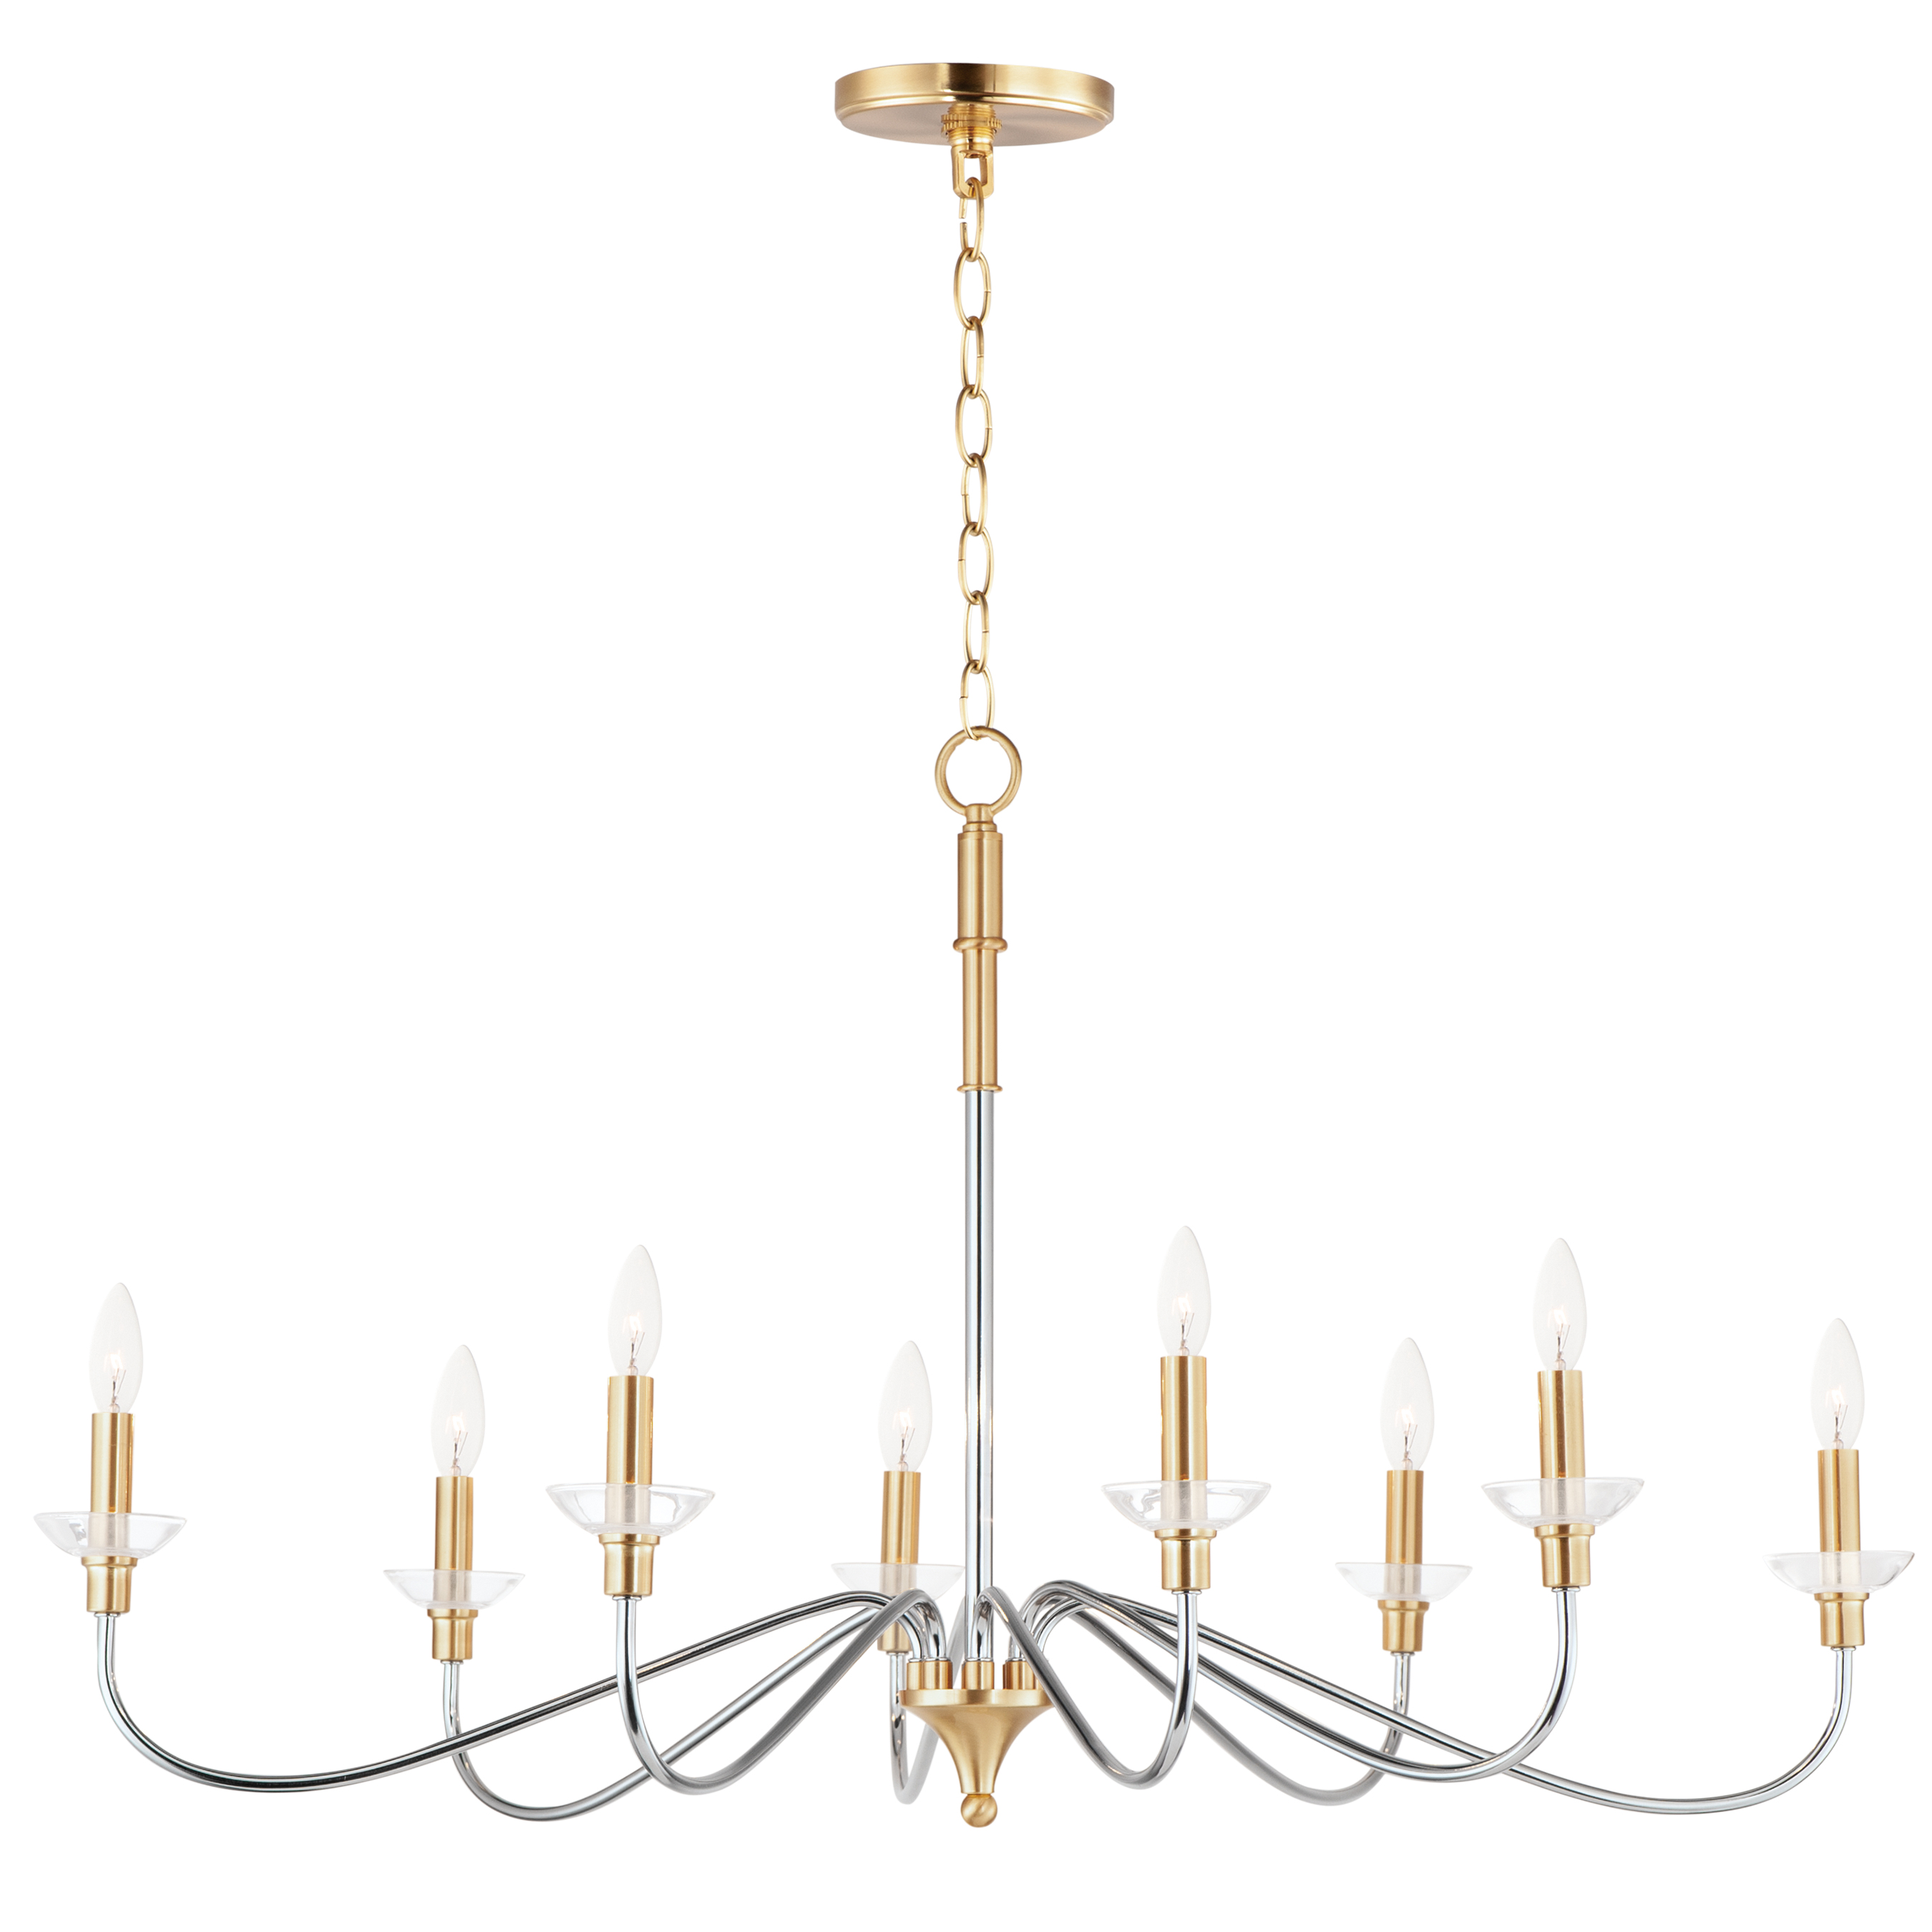 Clarion 8-Light Chandelier | Maxim Lighting